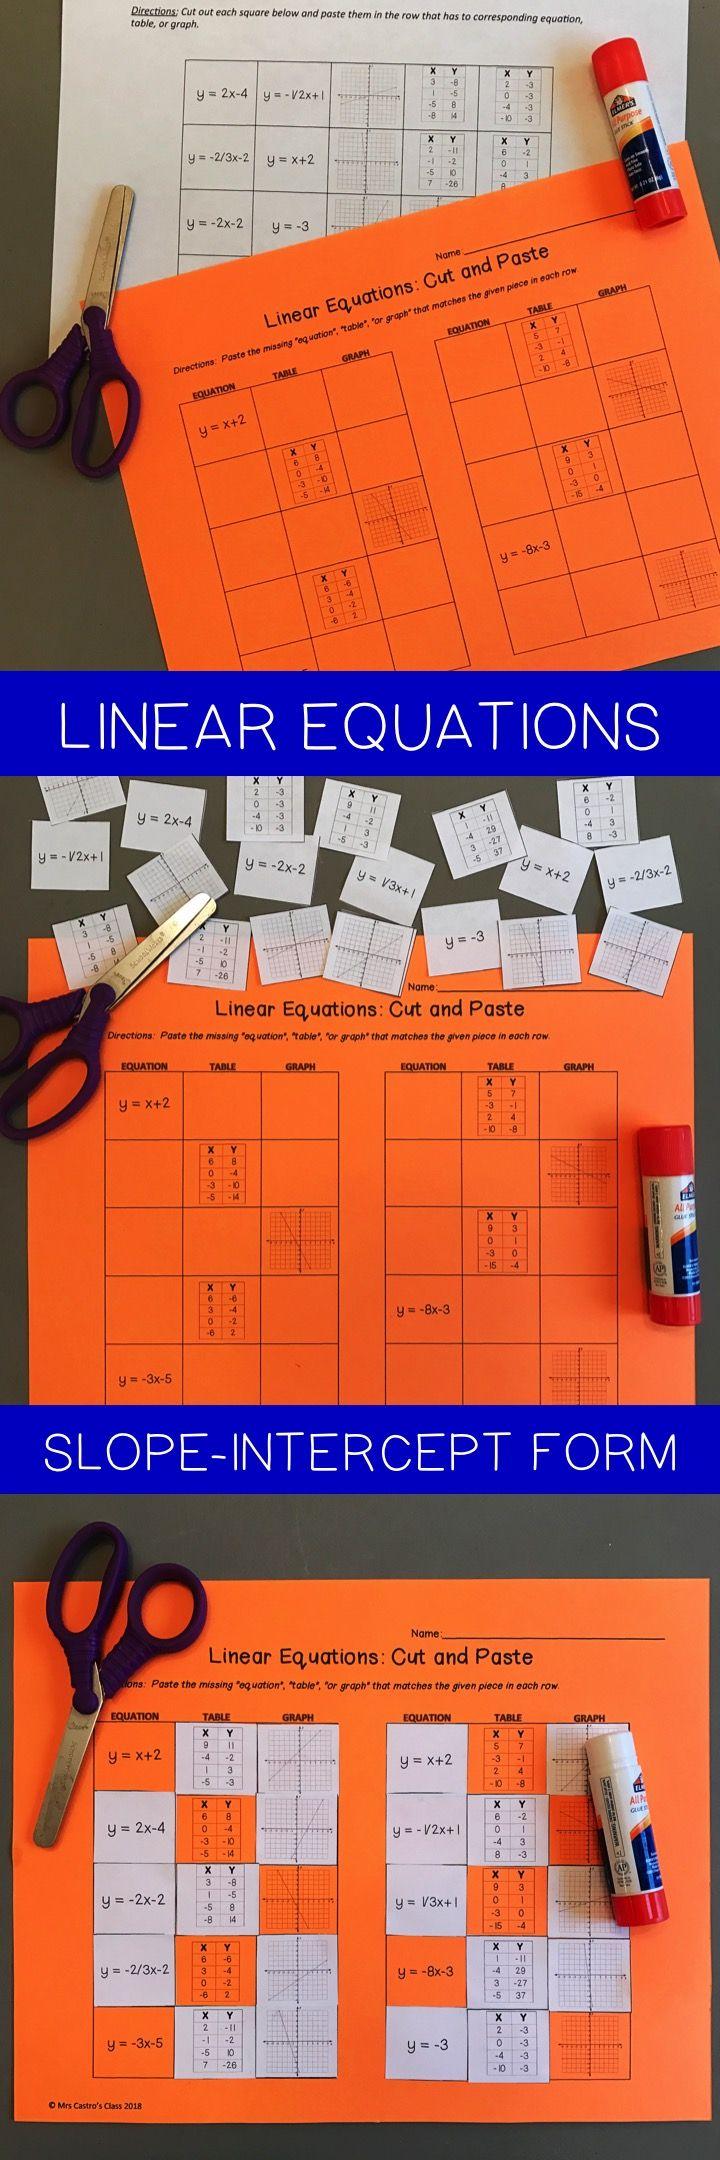 Linear Equations SlopeIntercept Form Cut and Paste